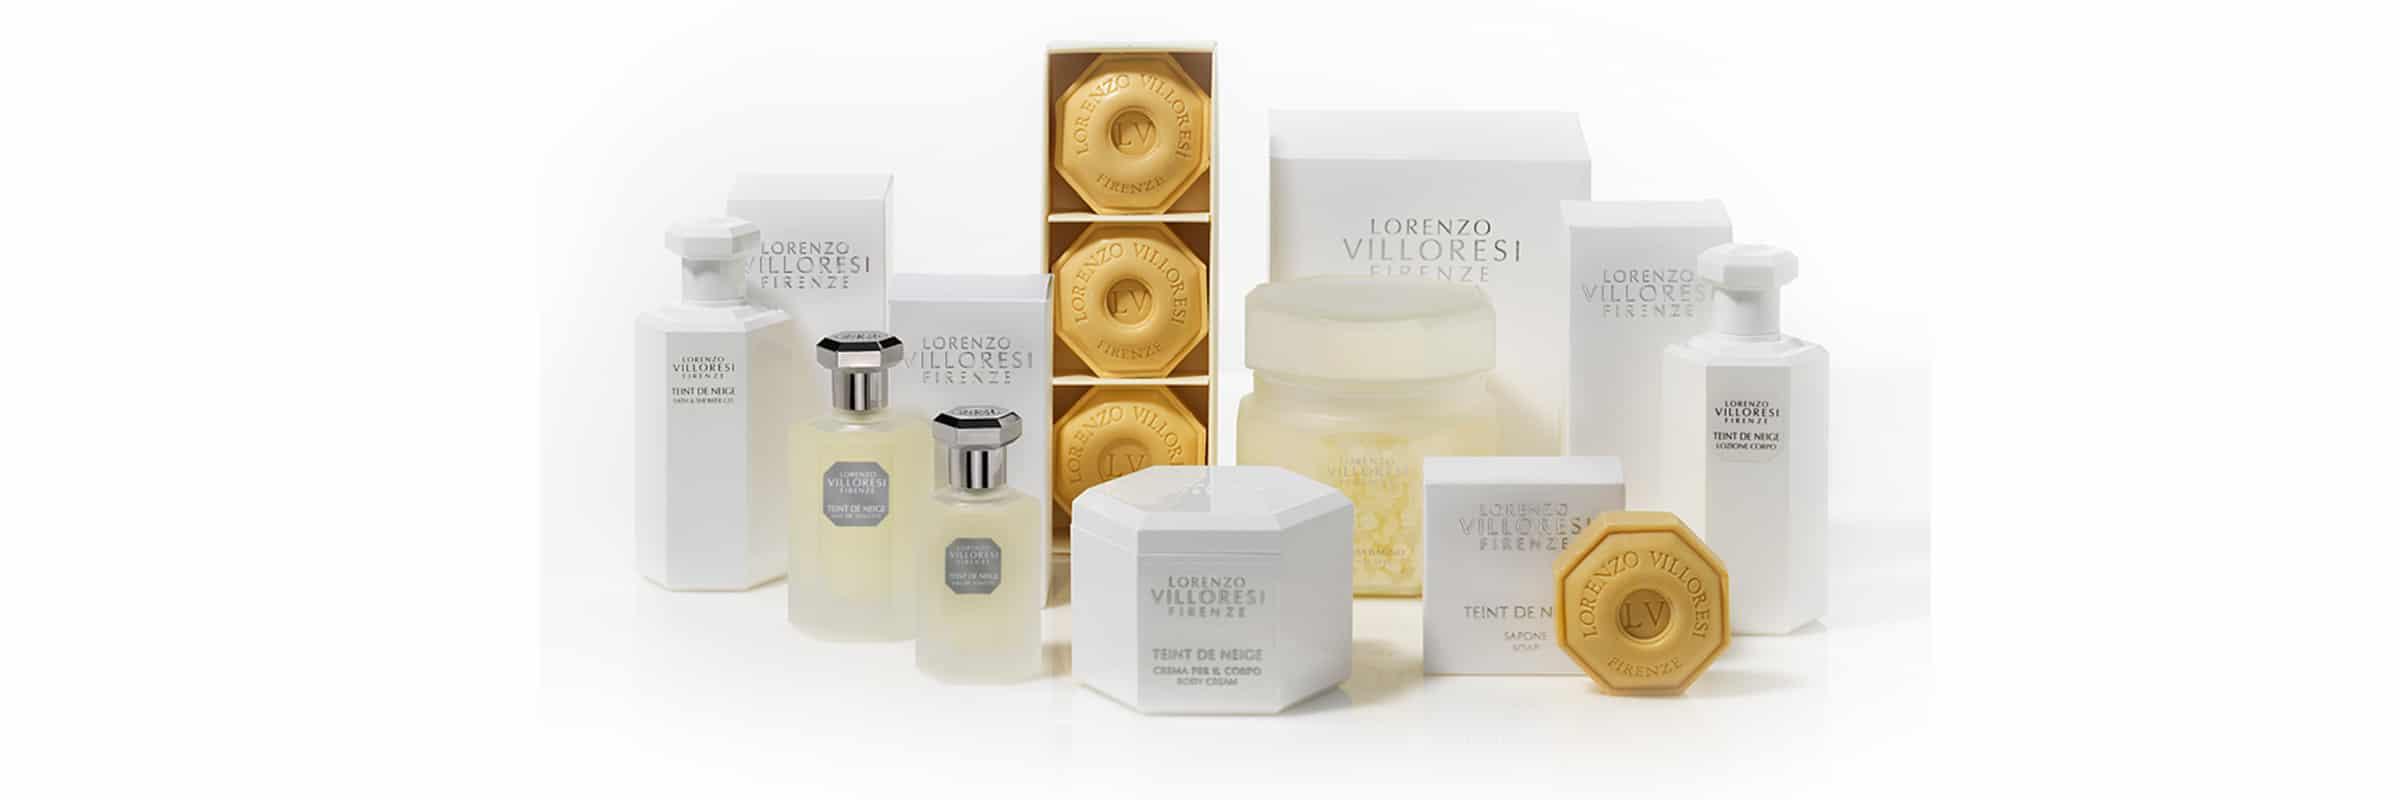 lorenzo-villoresi-perfumers-firenze-thumbnail